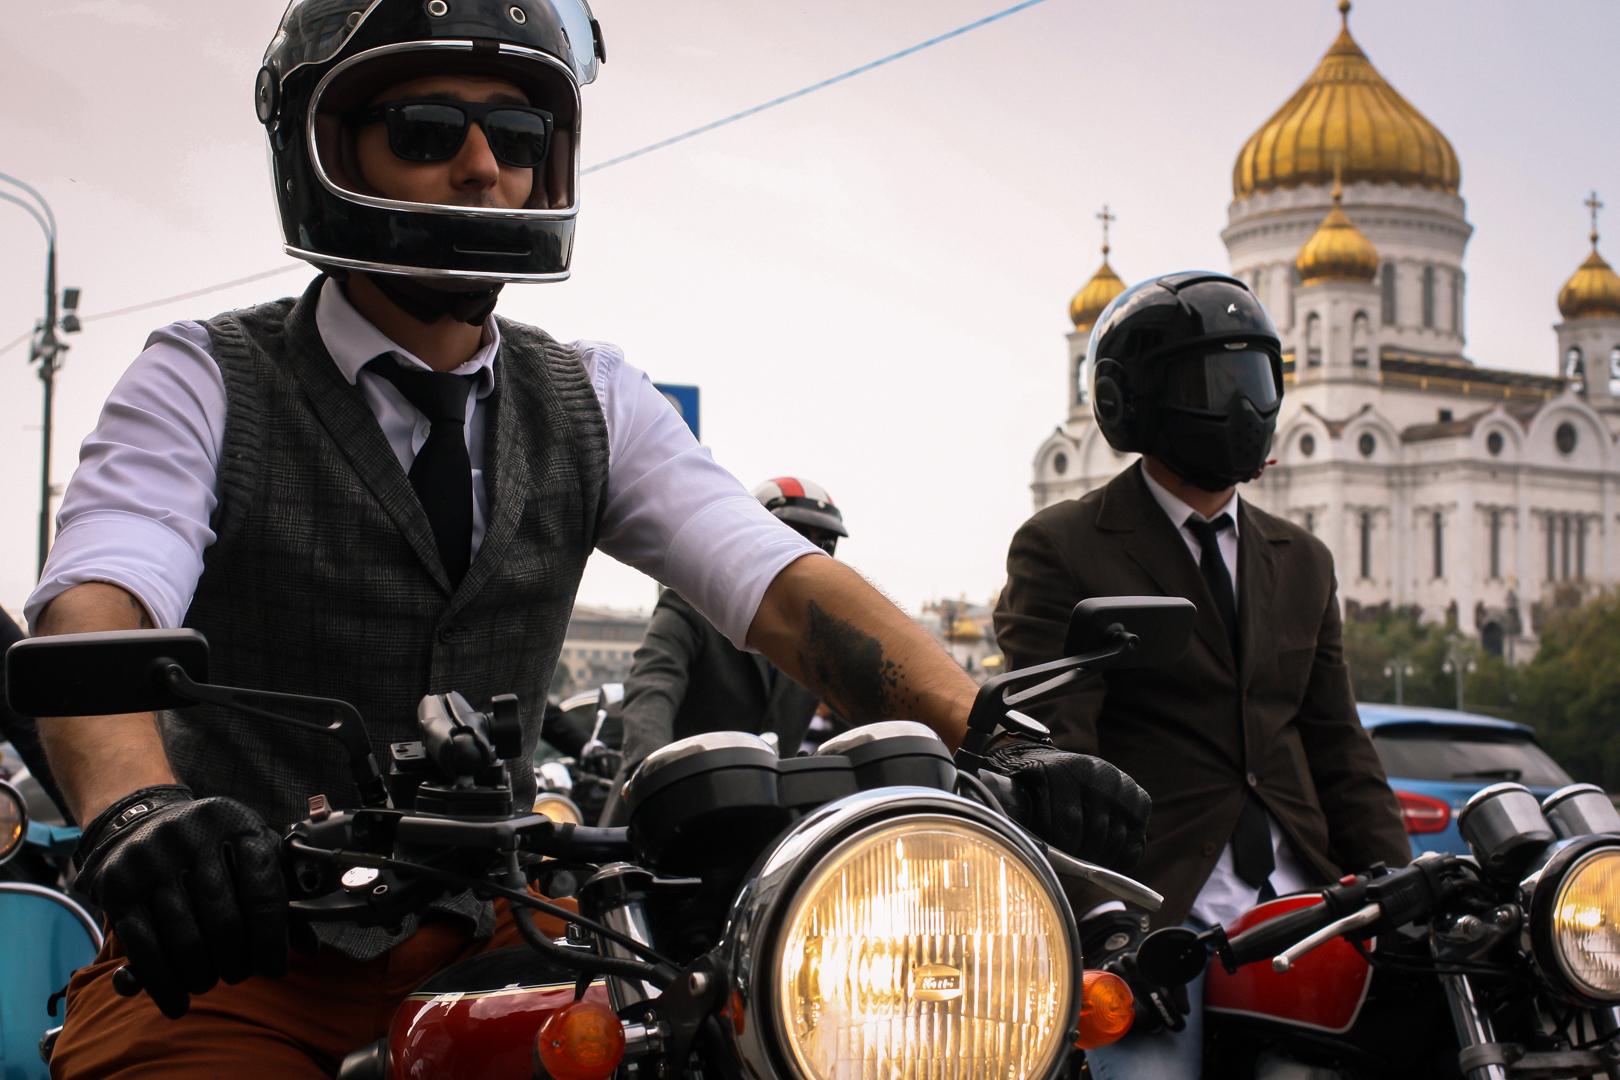 DGR2015_Moscow_Petr_Toluzakov.jpg